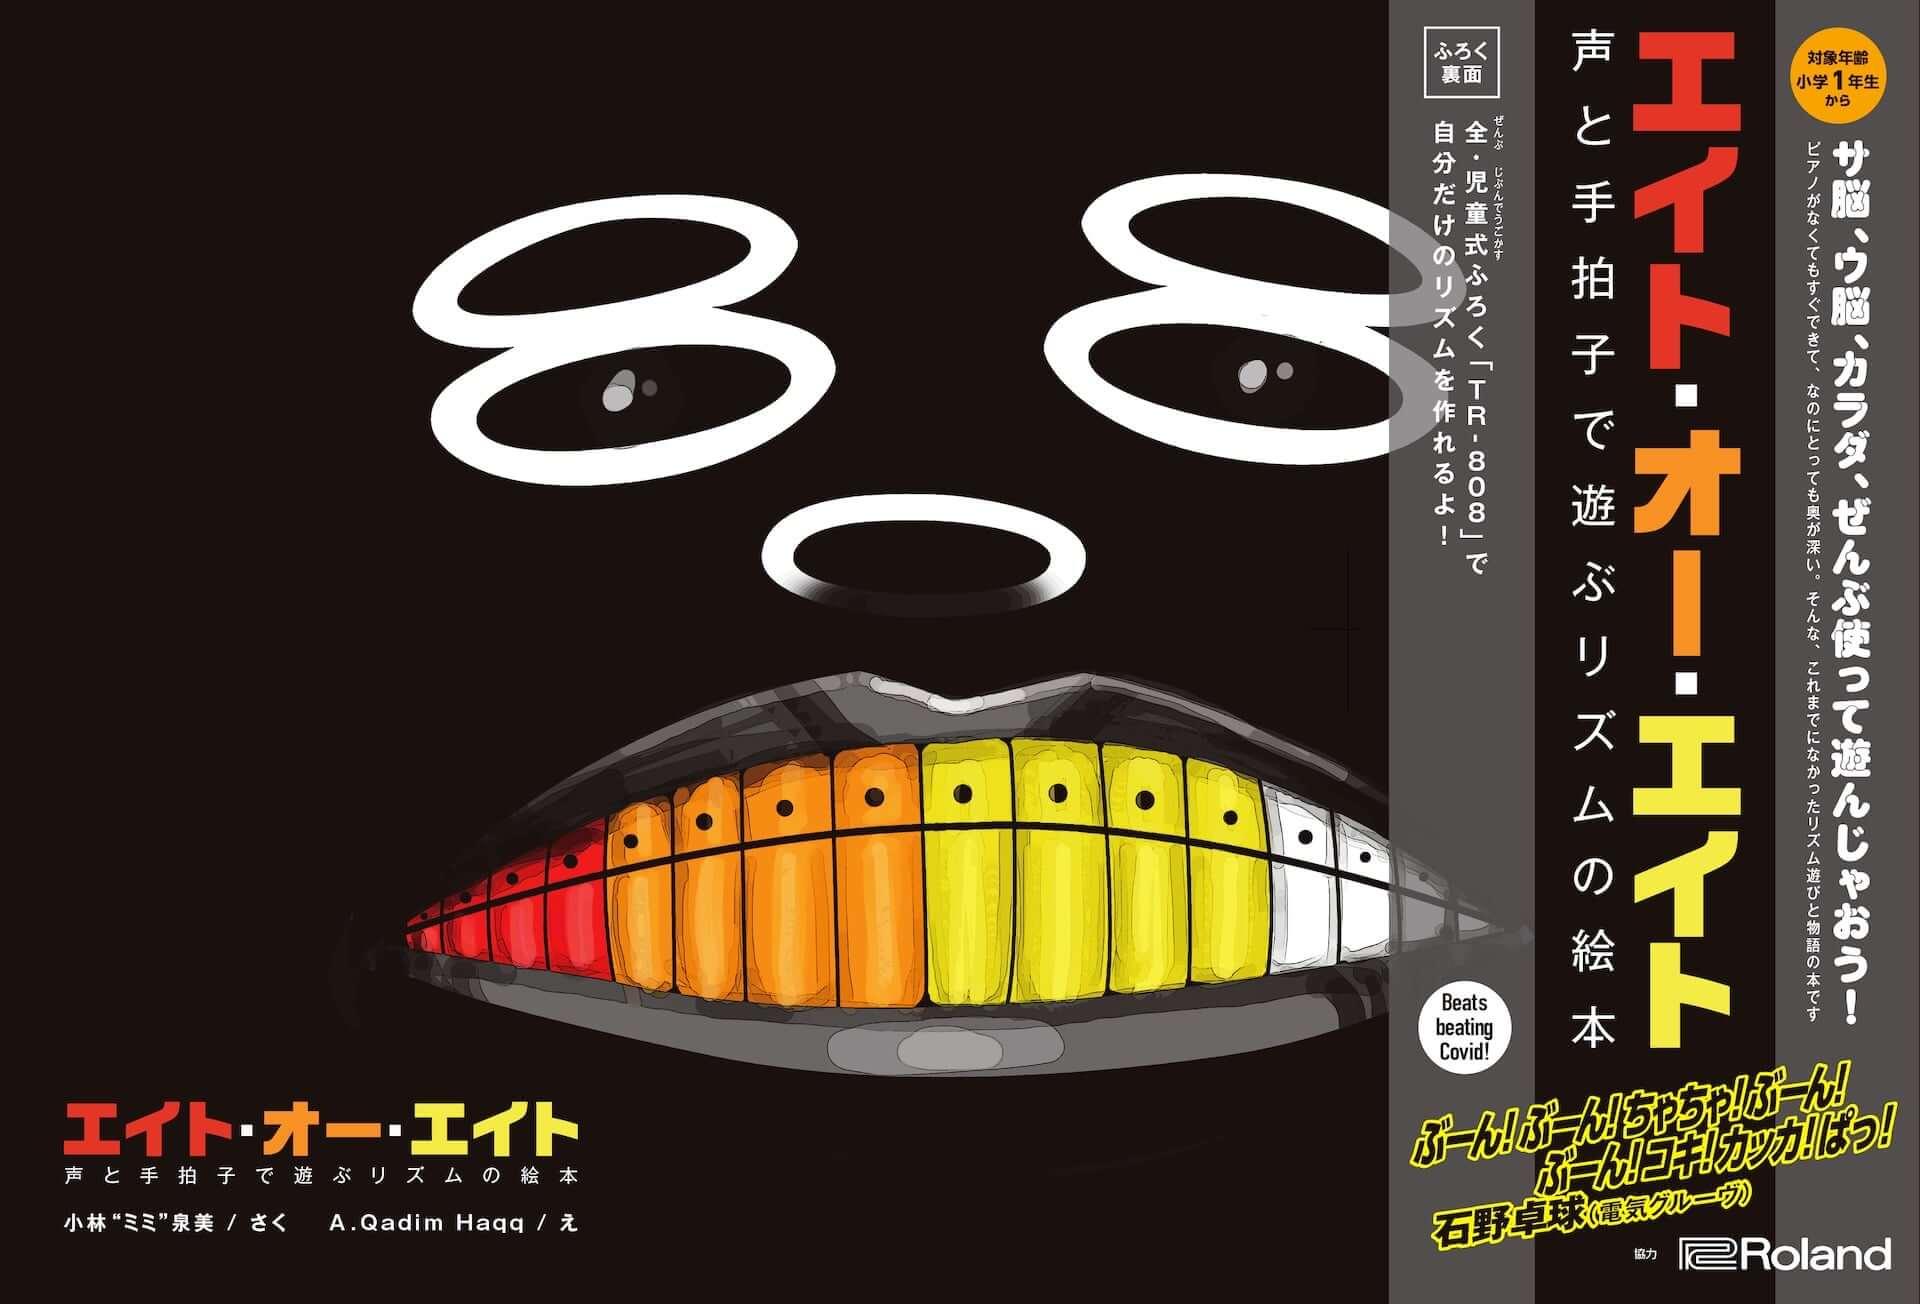 "『TR-808』をモチーフにした児童書を小林""ミミ""泉美が執筆!『エイト・オー・エイト - 声と手拍子で遊ぶリズム絵本 -』が発売決定 art210115_monogon_12-1920x1304"